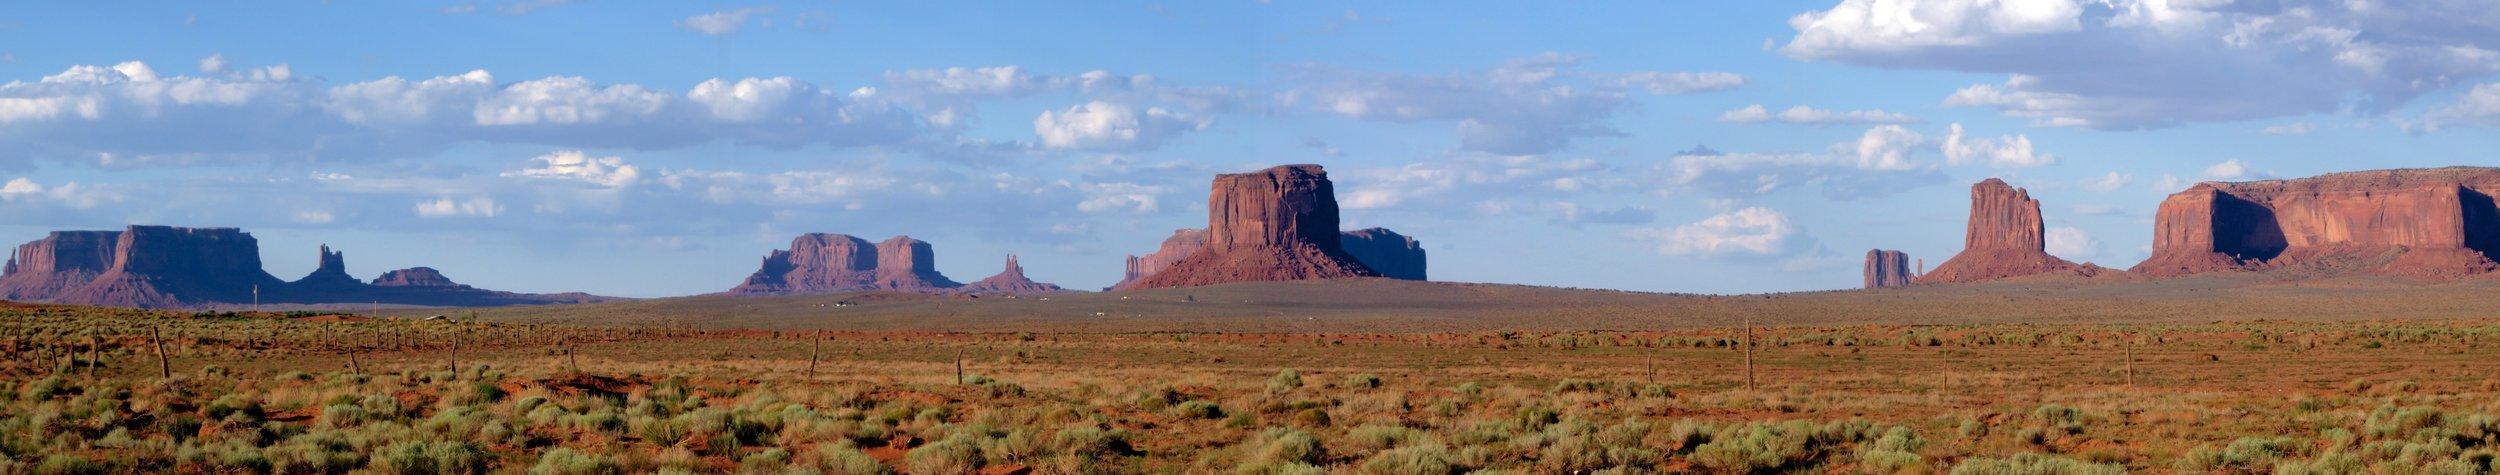 Monument Valley Navajo Indian Tribal Park Utah